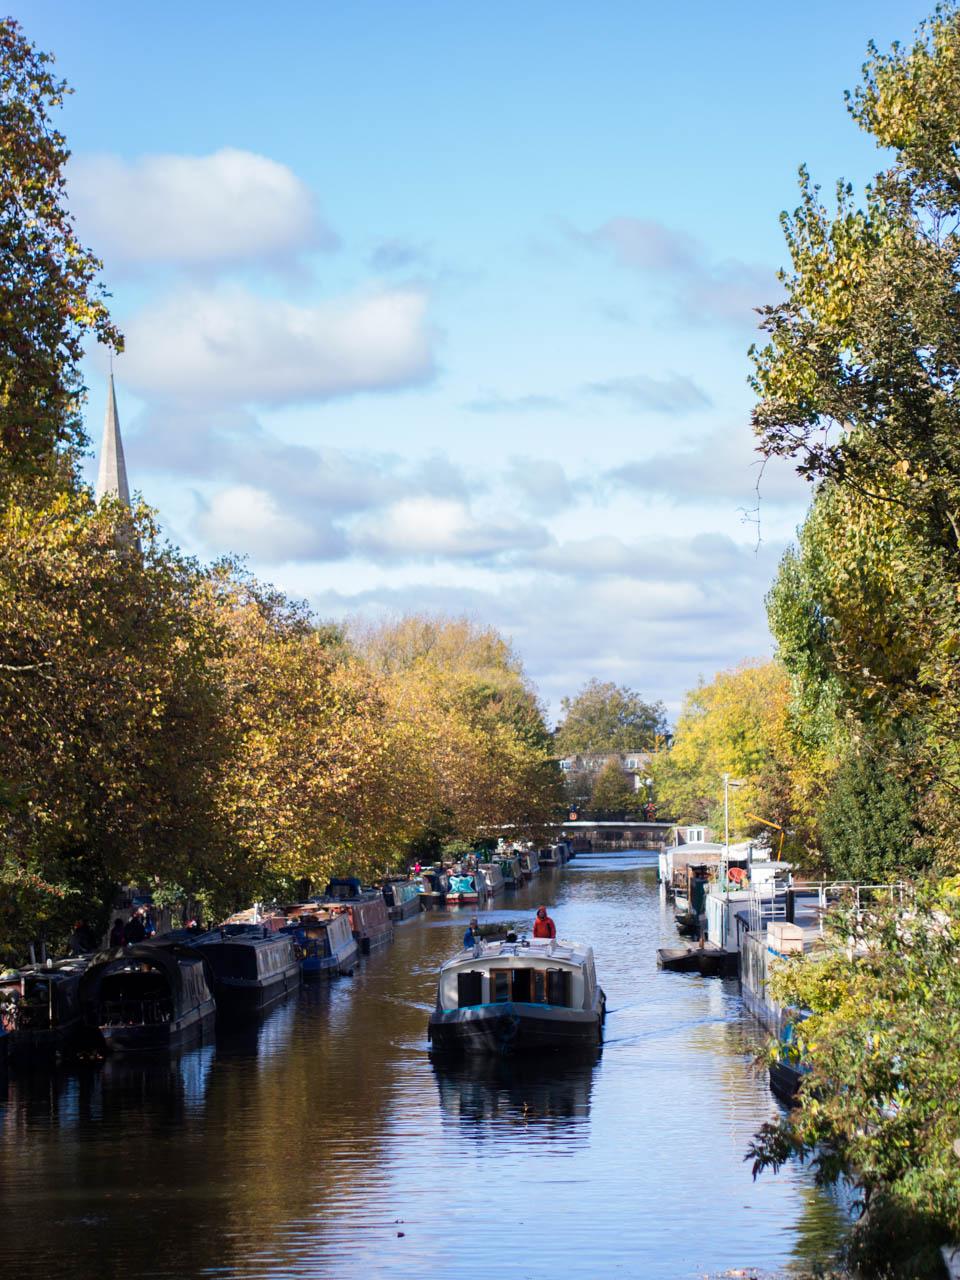 london-little-venice-canal